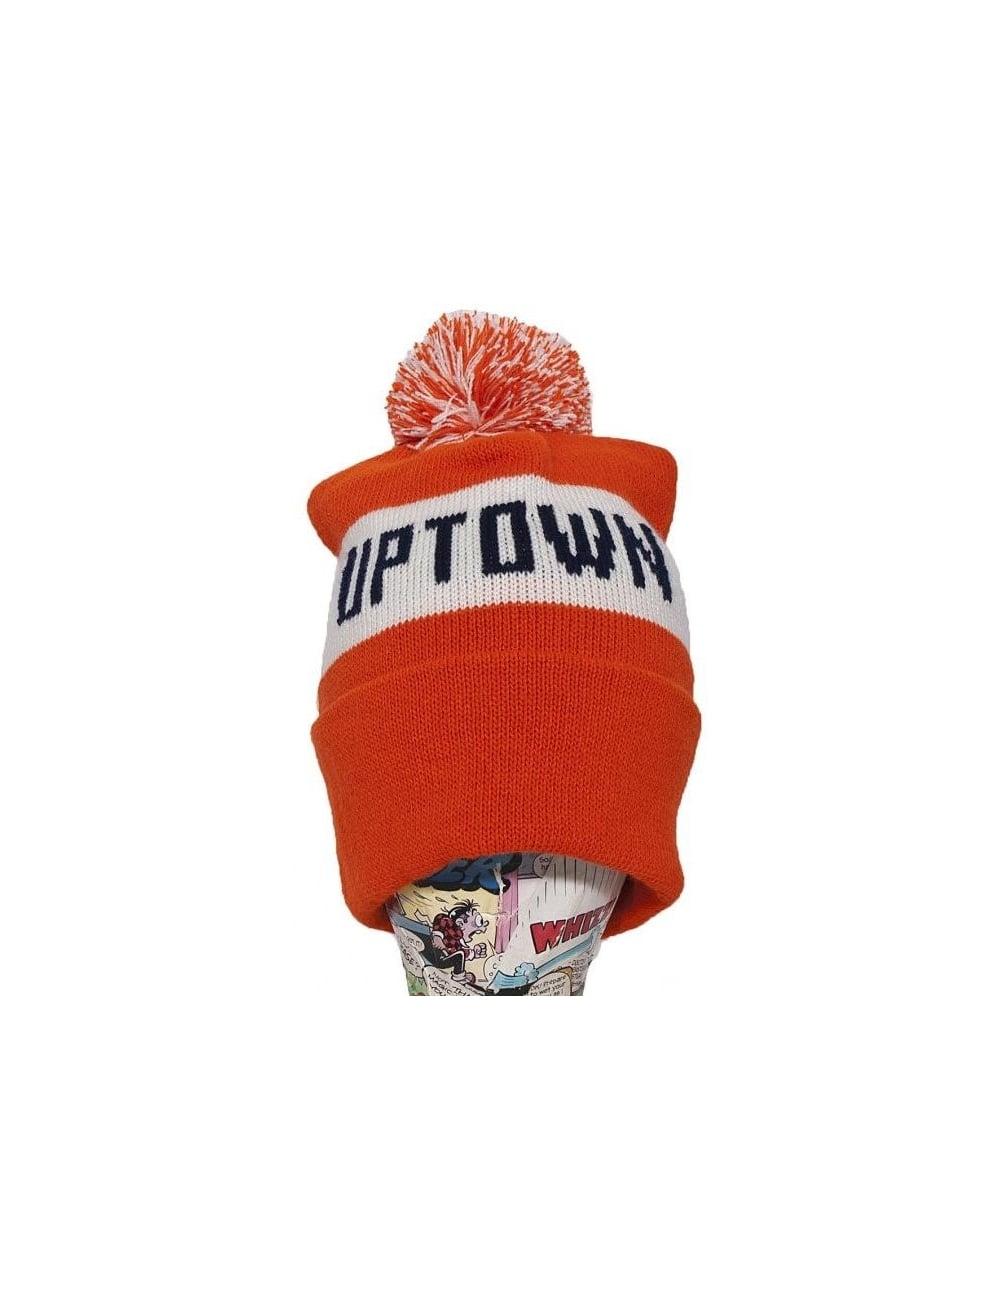 Headwear Only NY Clothing Uptown Wildlife Beanie - Orange